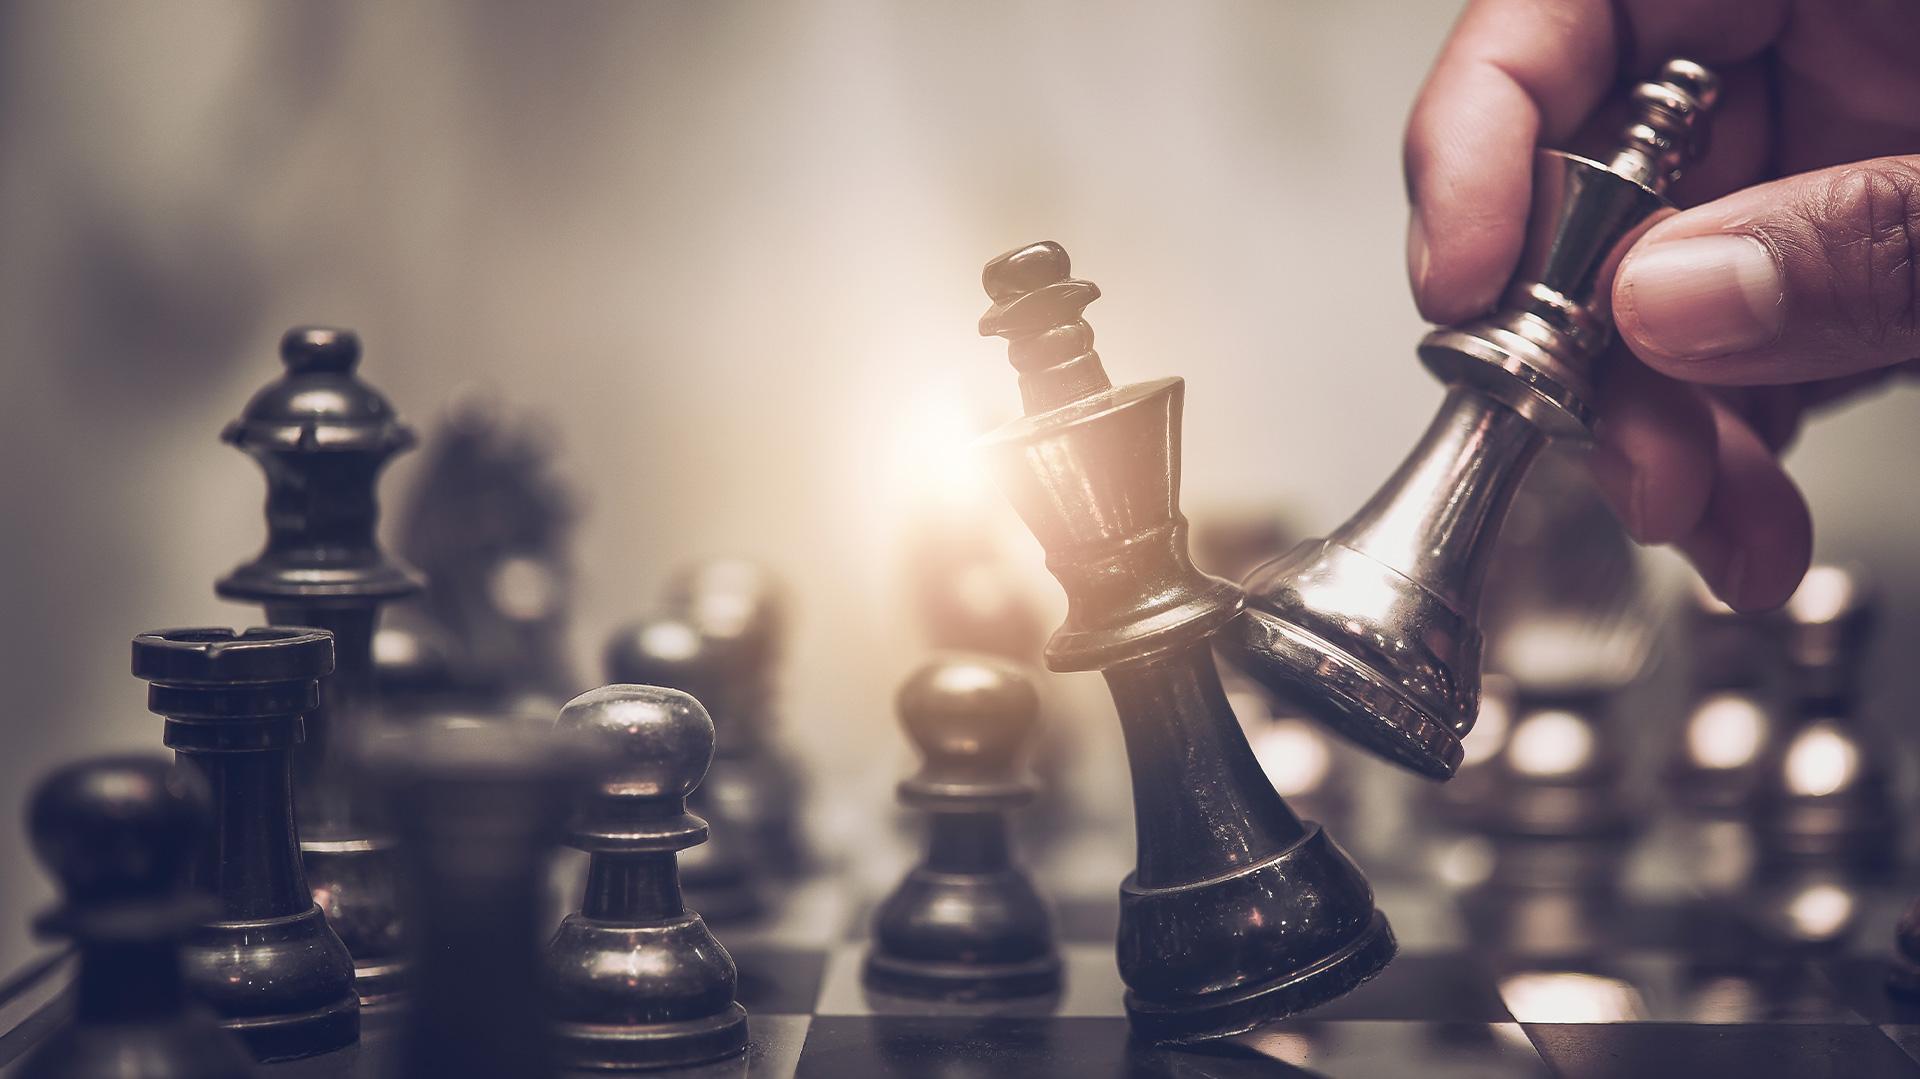 https://www.agilityconsulting.be/wp-content/uploads/2021/03/strategie-globale-societe.jpg